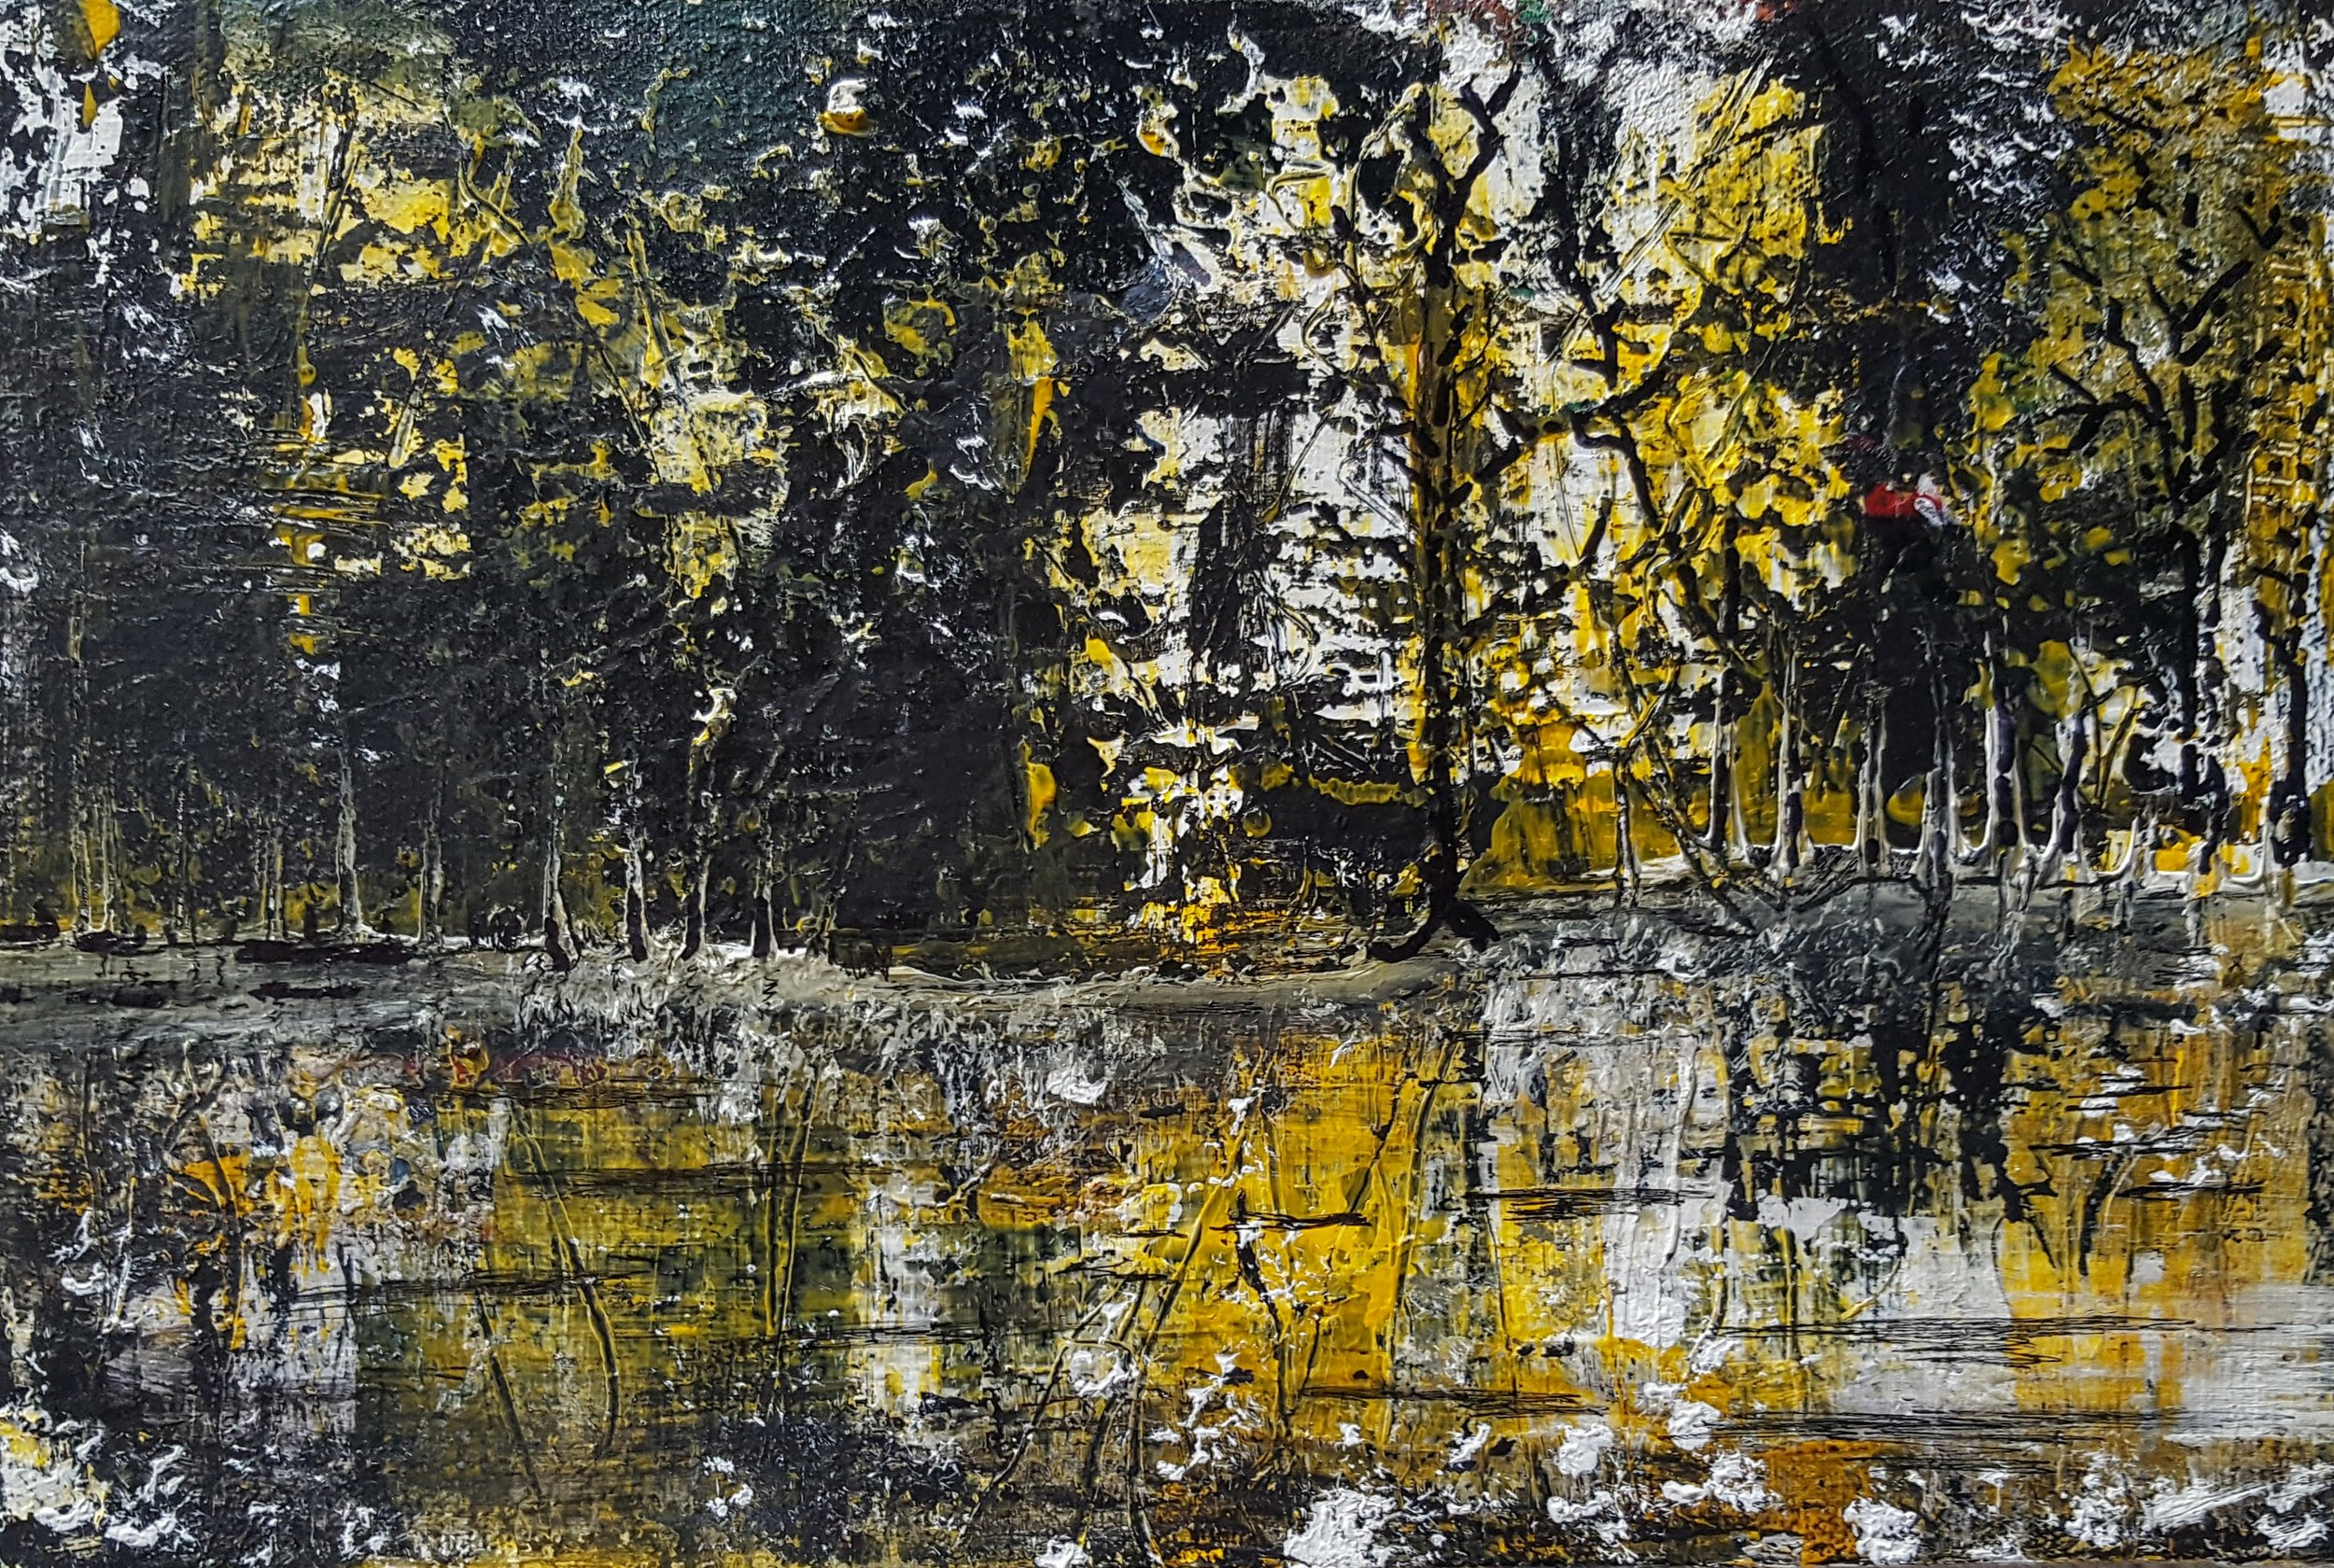 """Banyans"" by   Robert Leo Jones, acrylic on canvas, 9x12in (2016), $125 | BUY NOW"